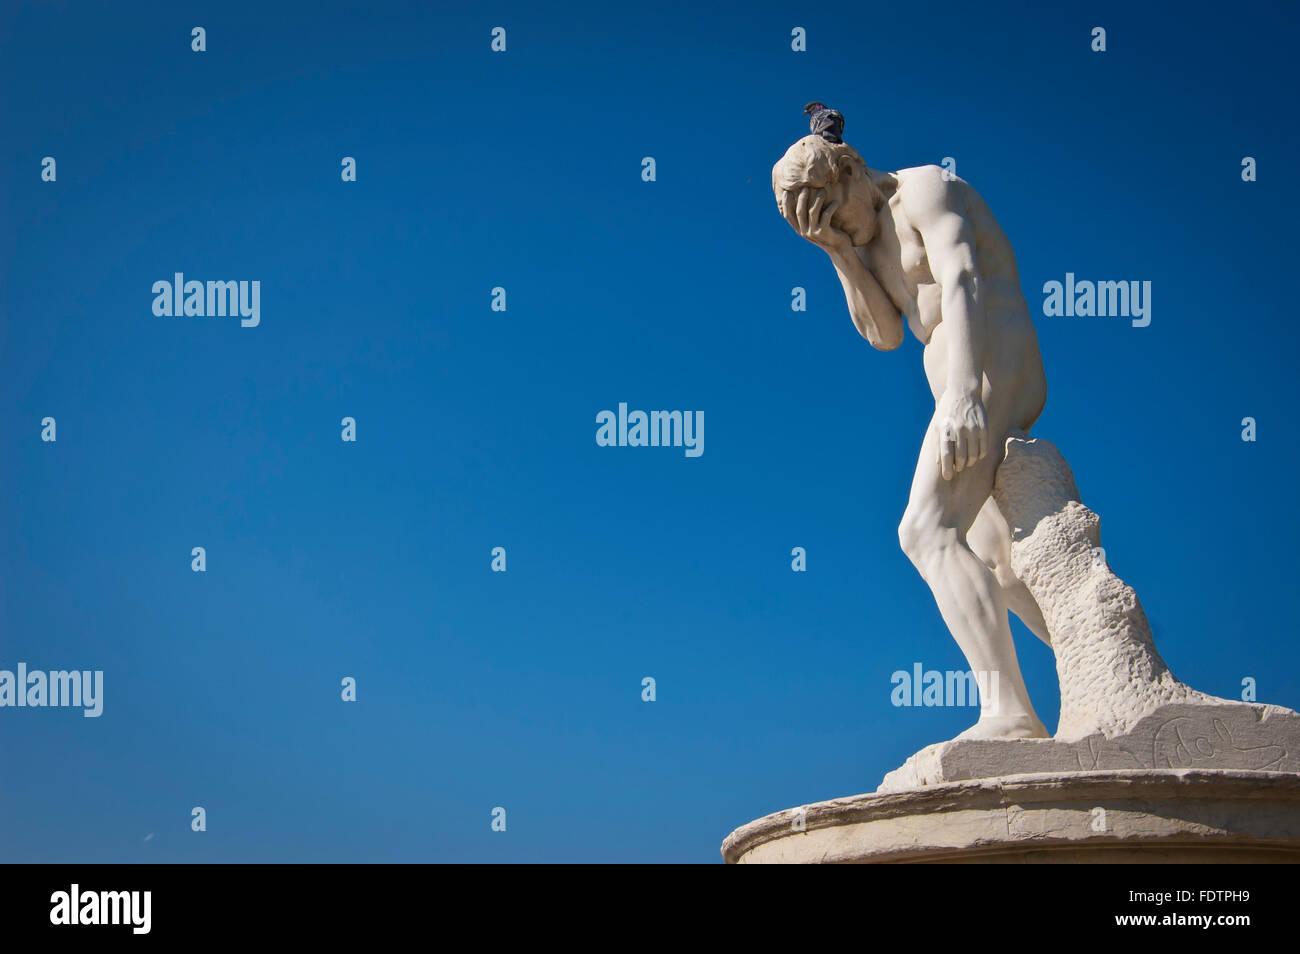 Frankreich, Paris, Skulptur im Jardin des Tuileries Stockbild